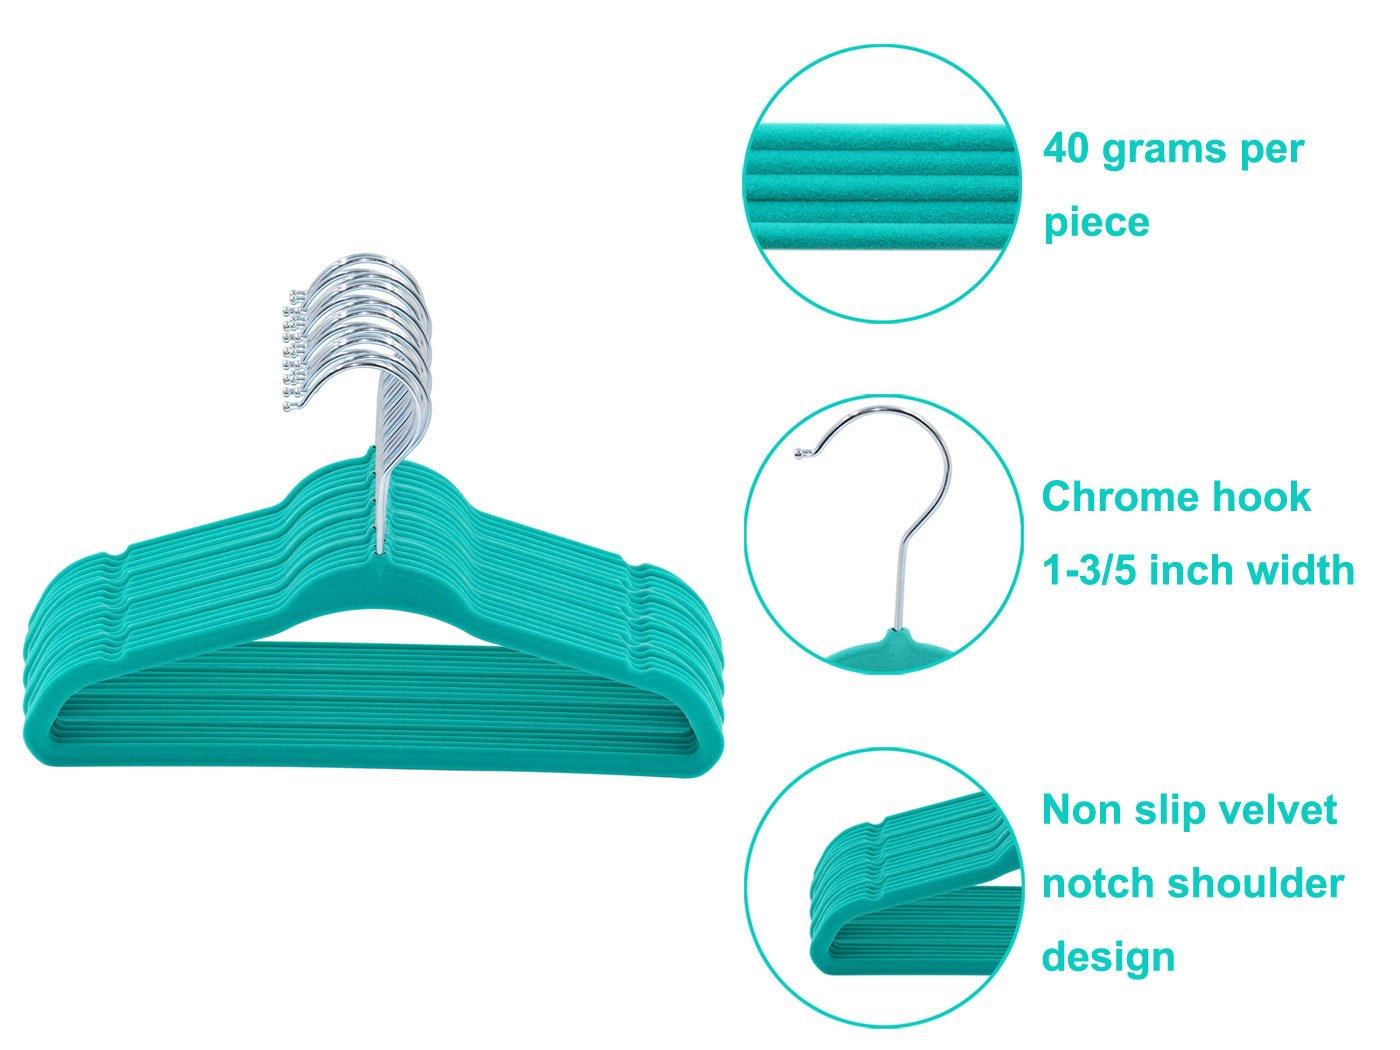 TQVAI 50 Pack Baby Velvet Clothes Hangers Non Slip Space Saver Beige